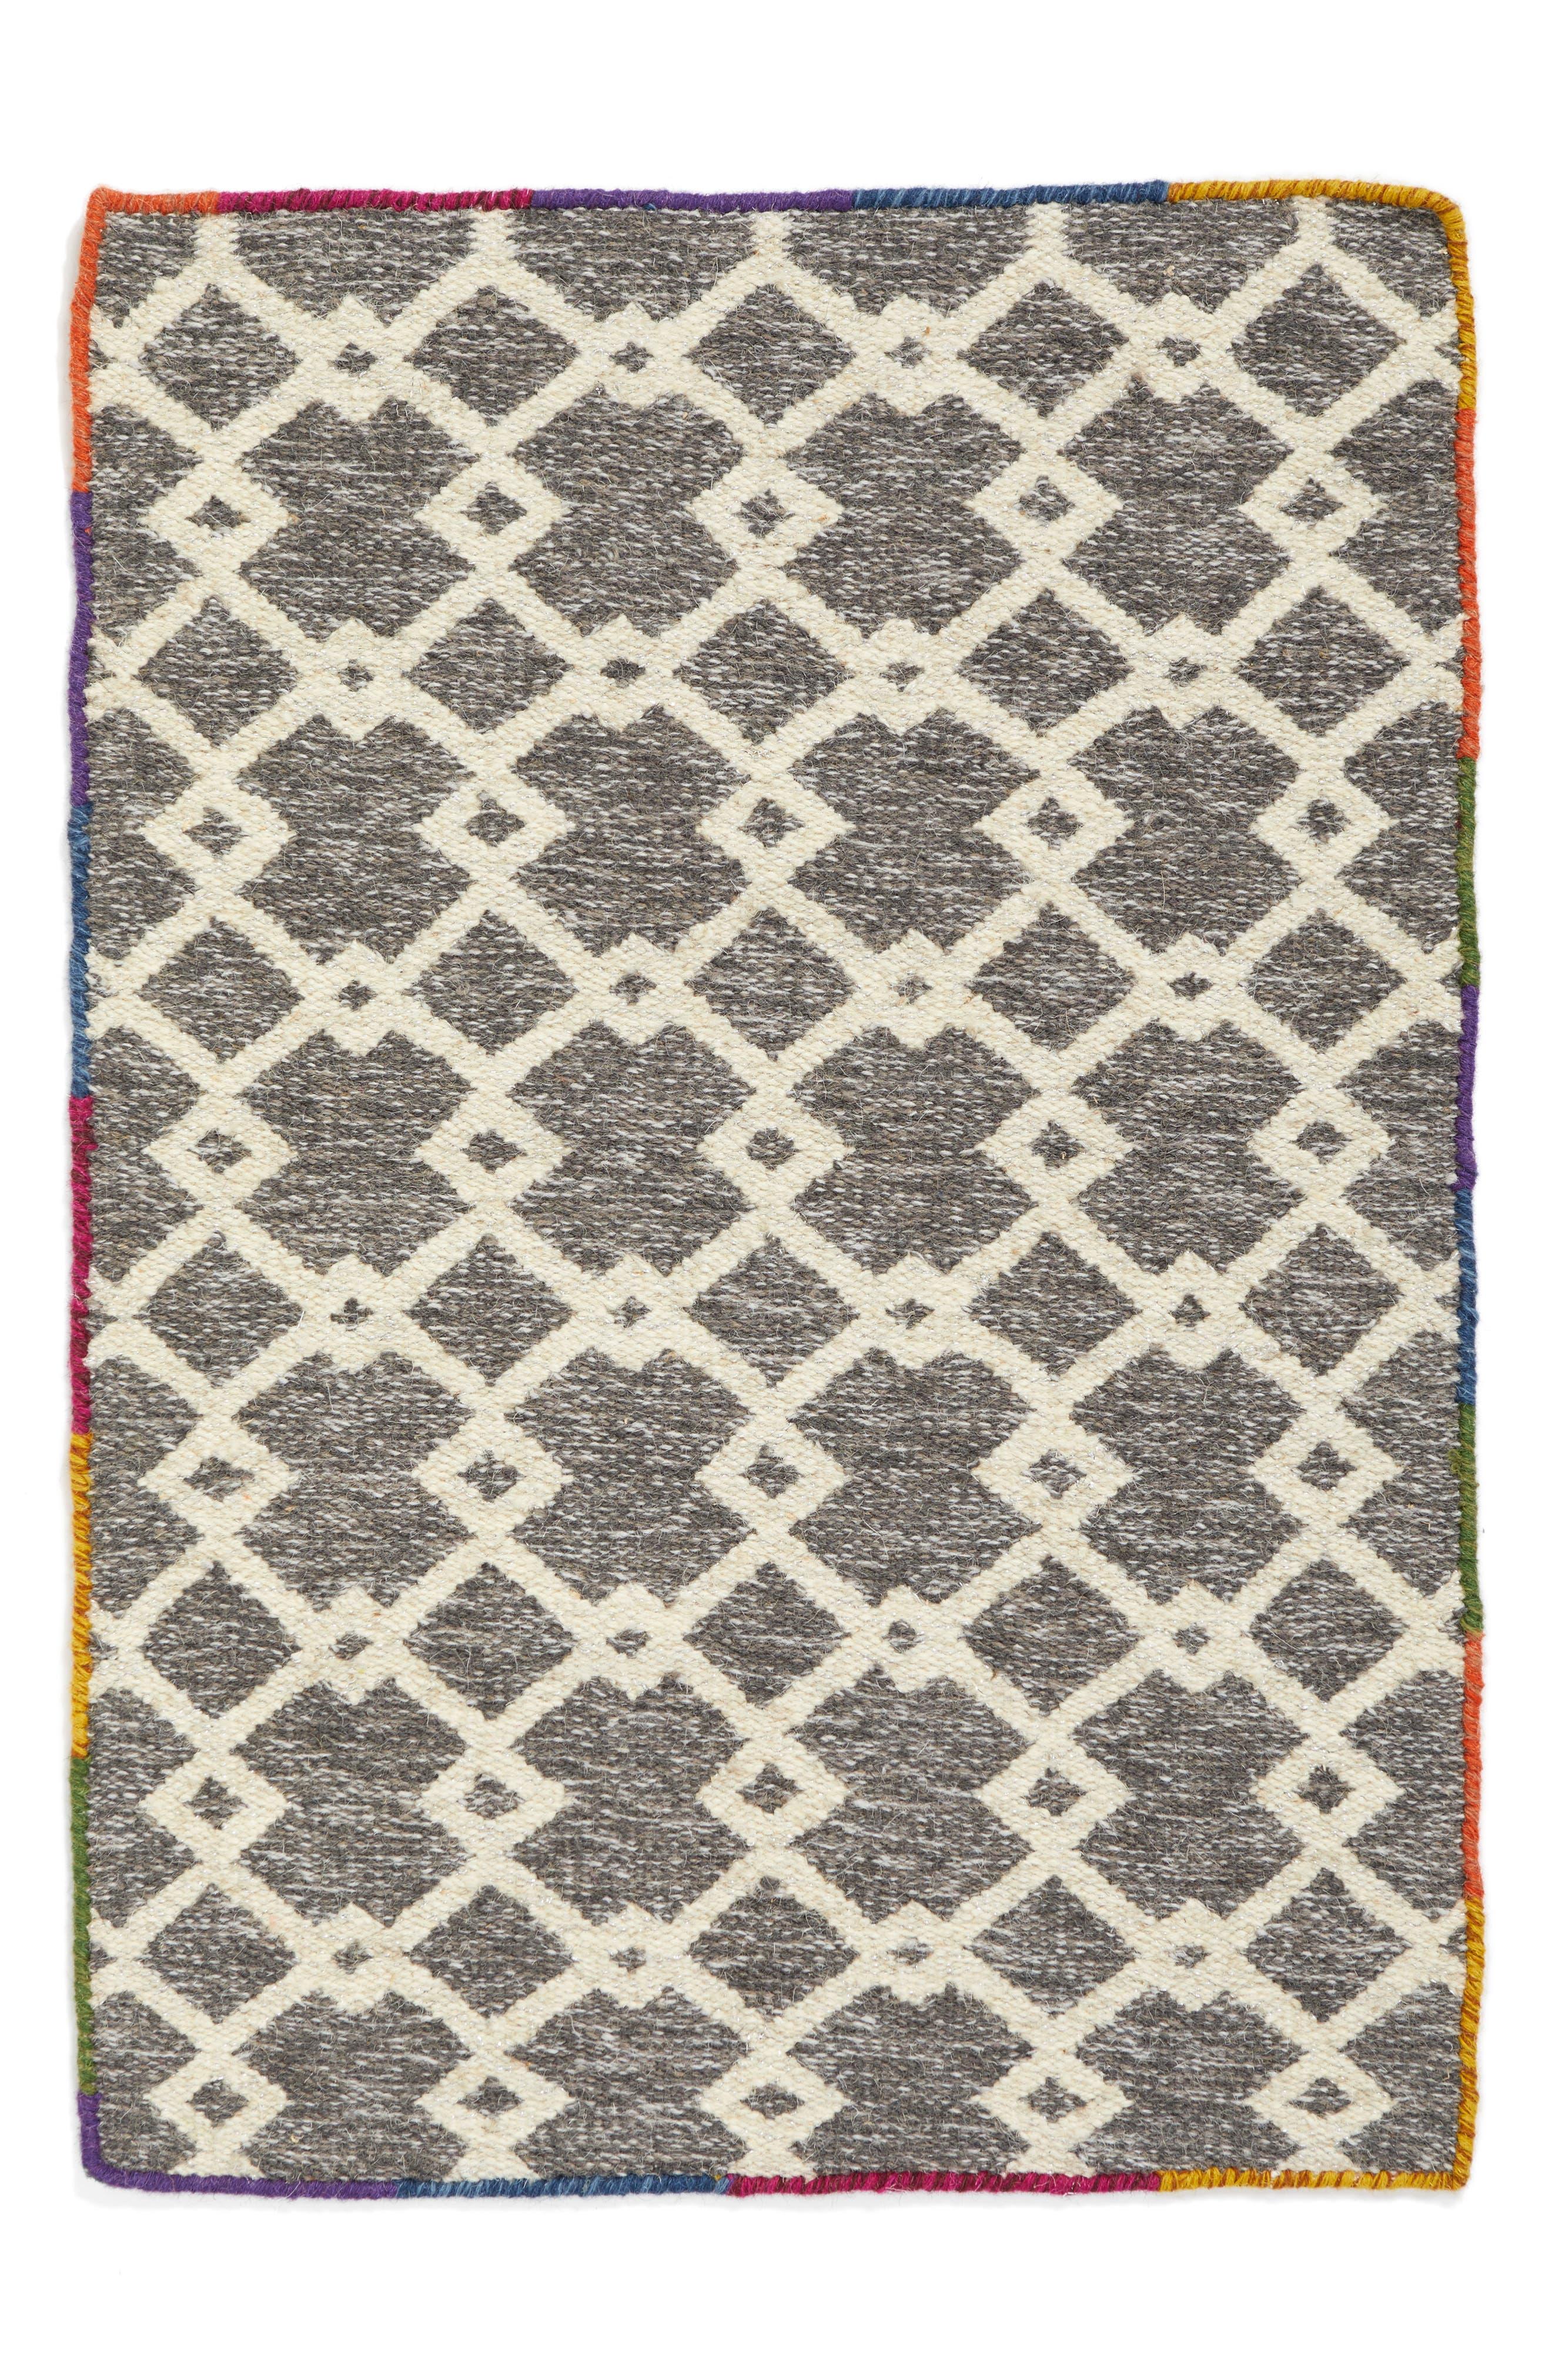 Lattice Handwoven Area Rug,                         Main,                         color, Grey Asphalt Multi